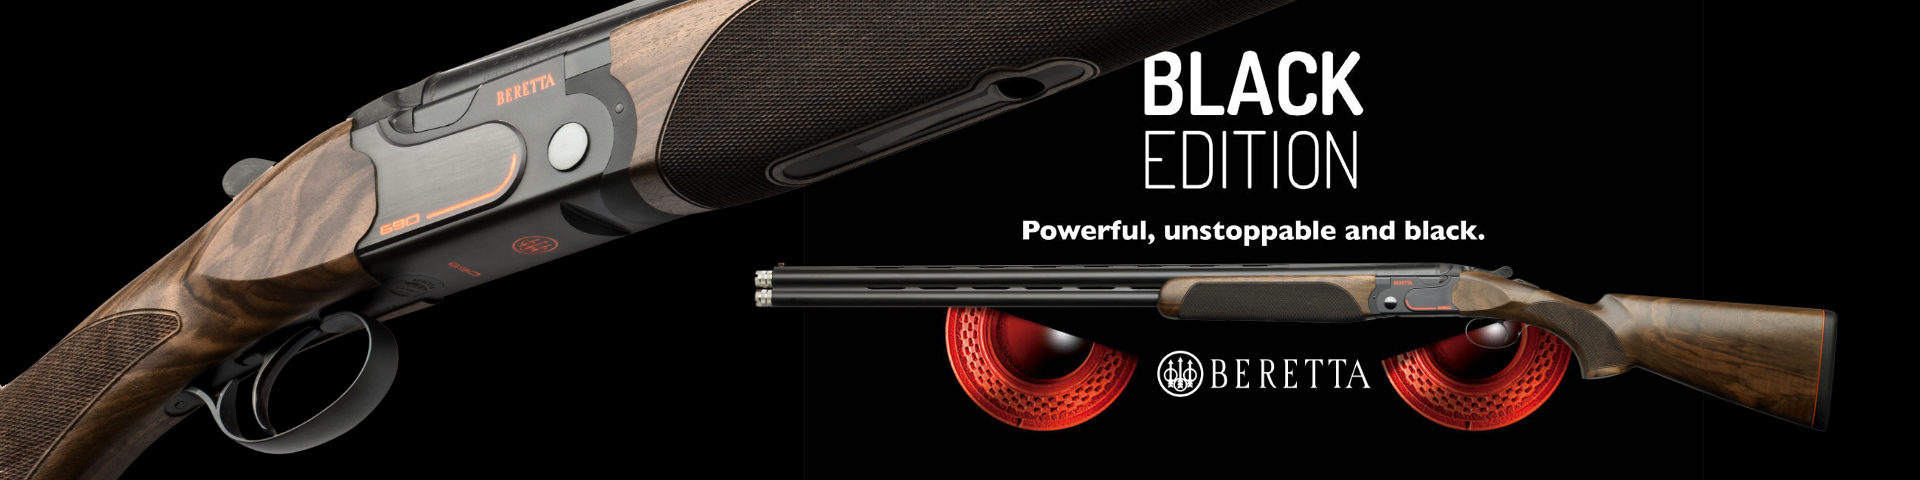 Beretta 690 Black